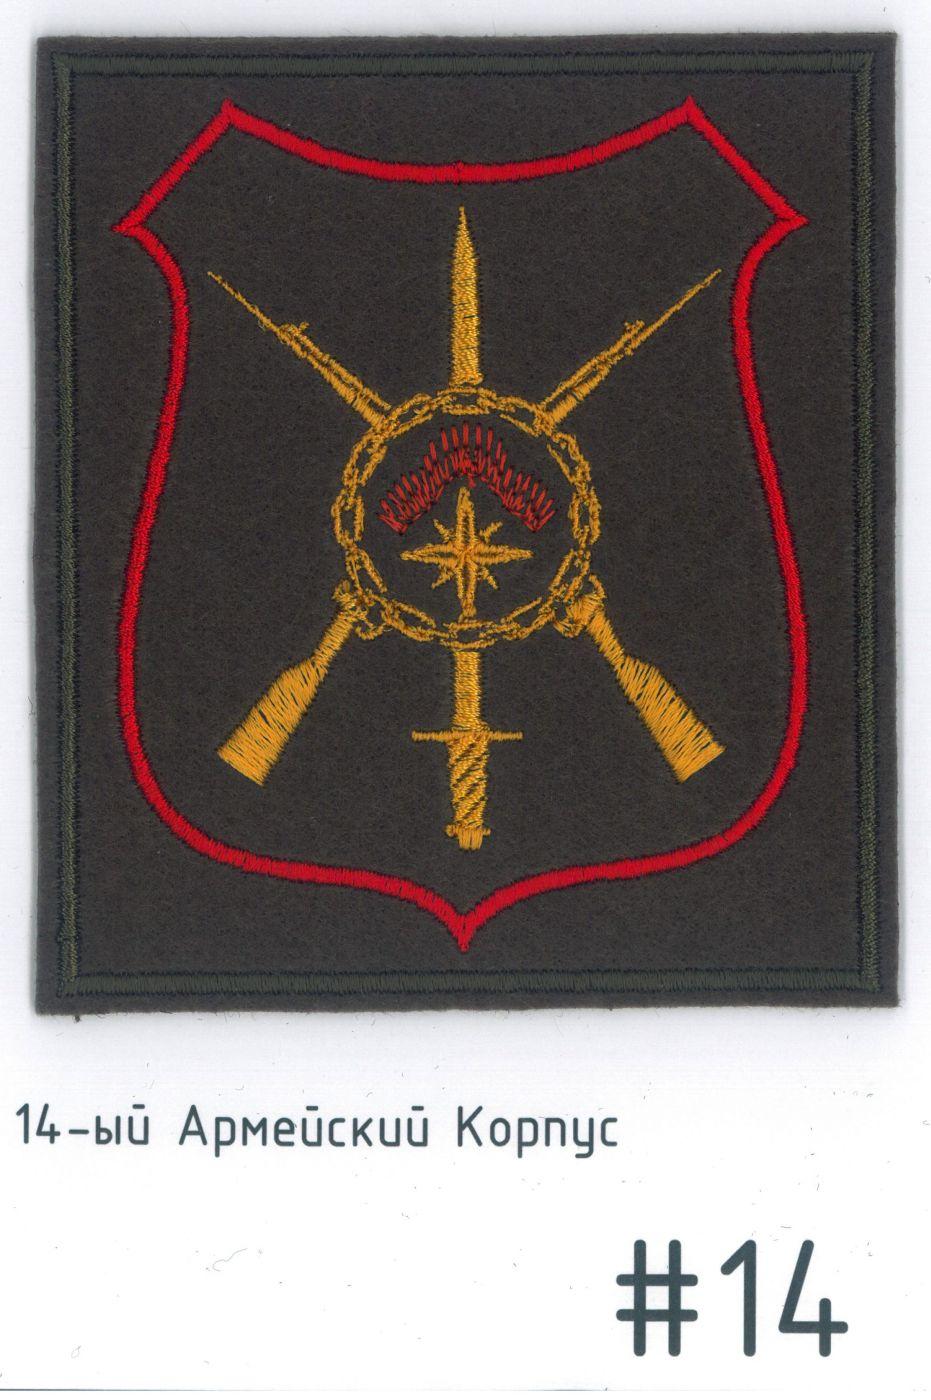 Шеврон 14-ый Армейский корпус.